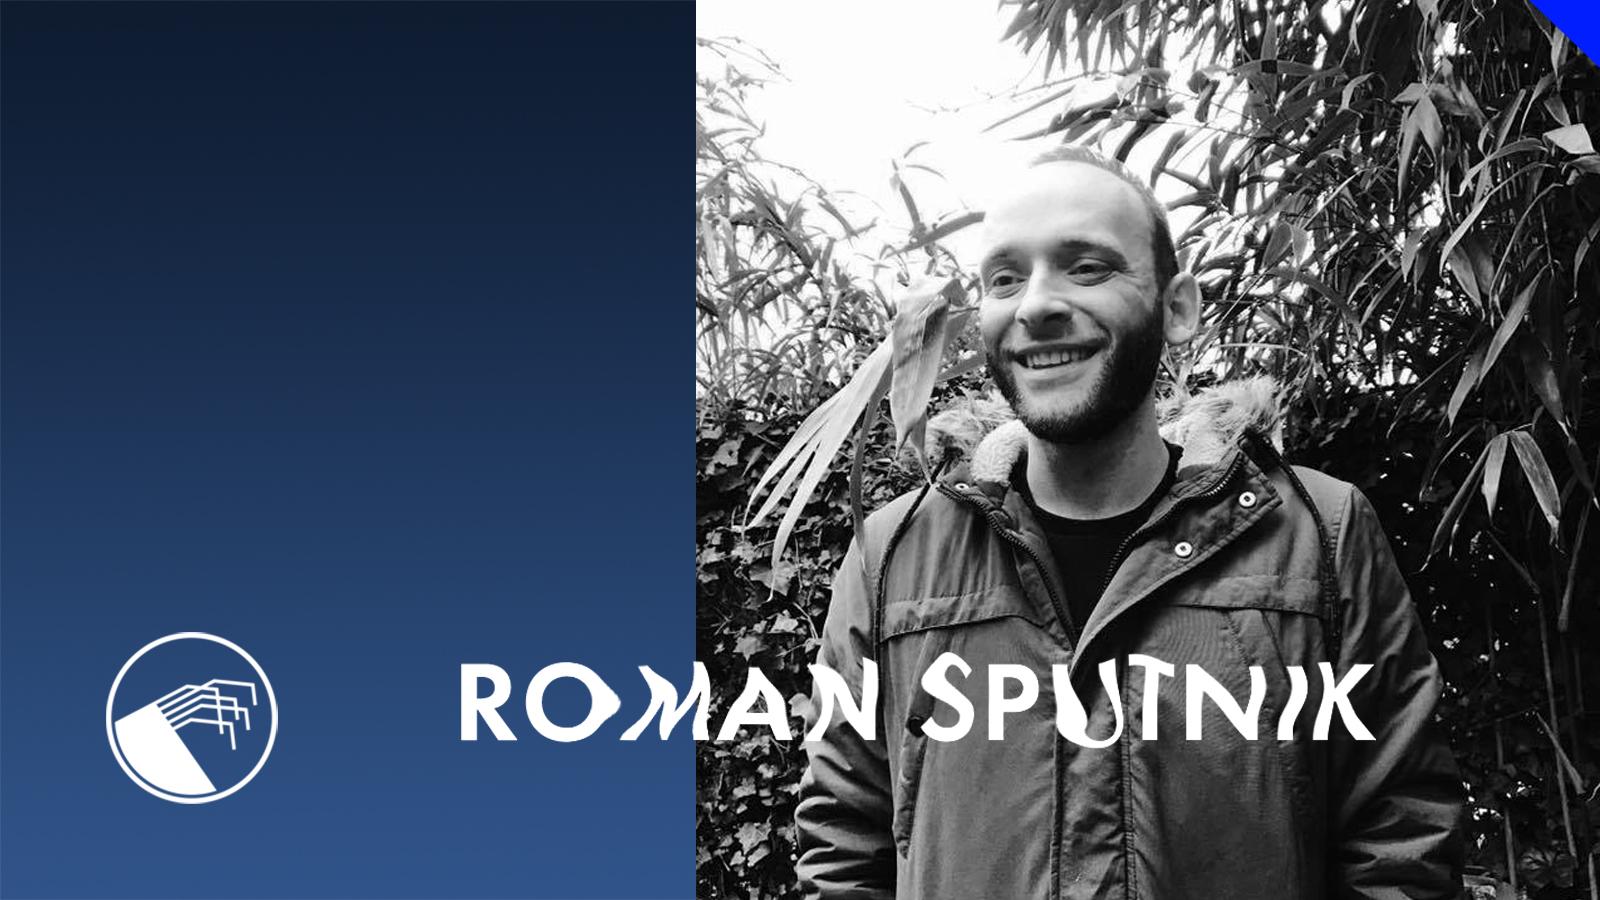 Roman Sputnik